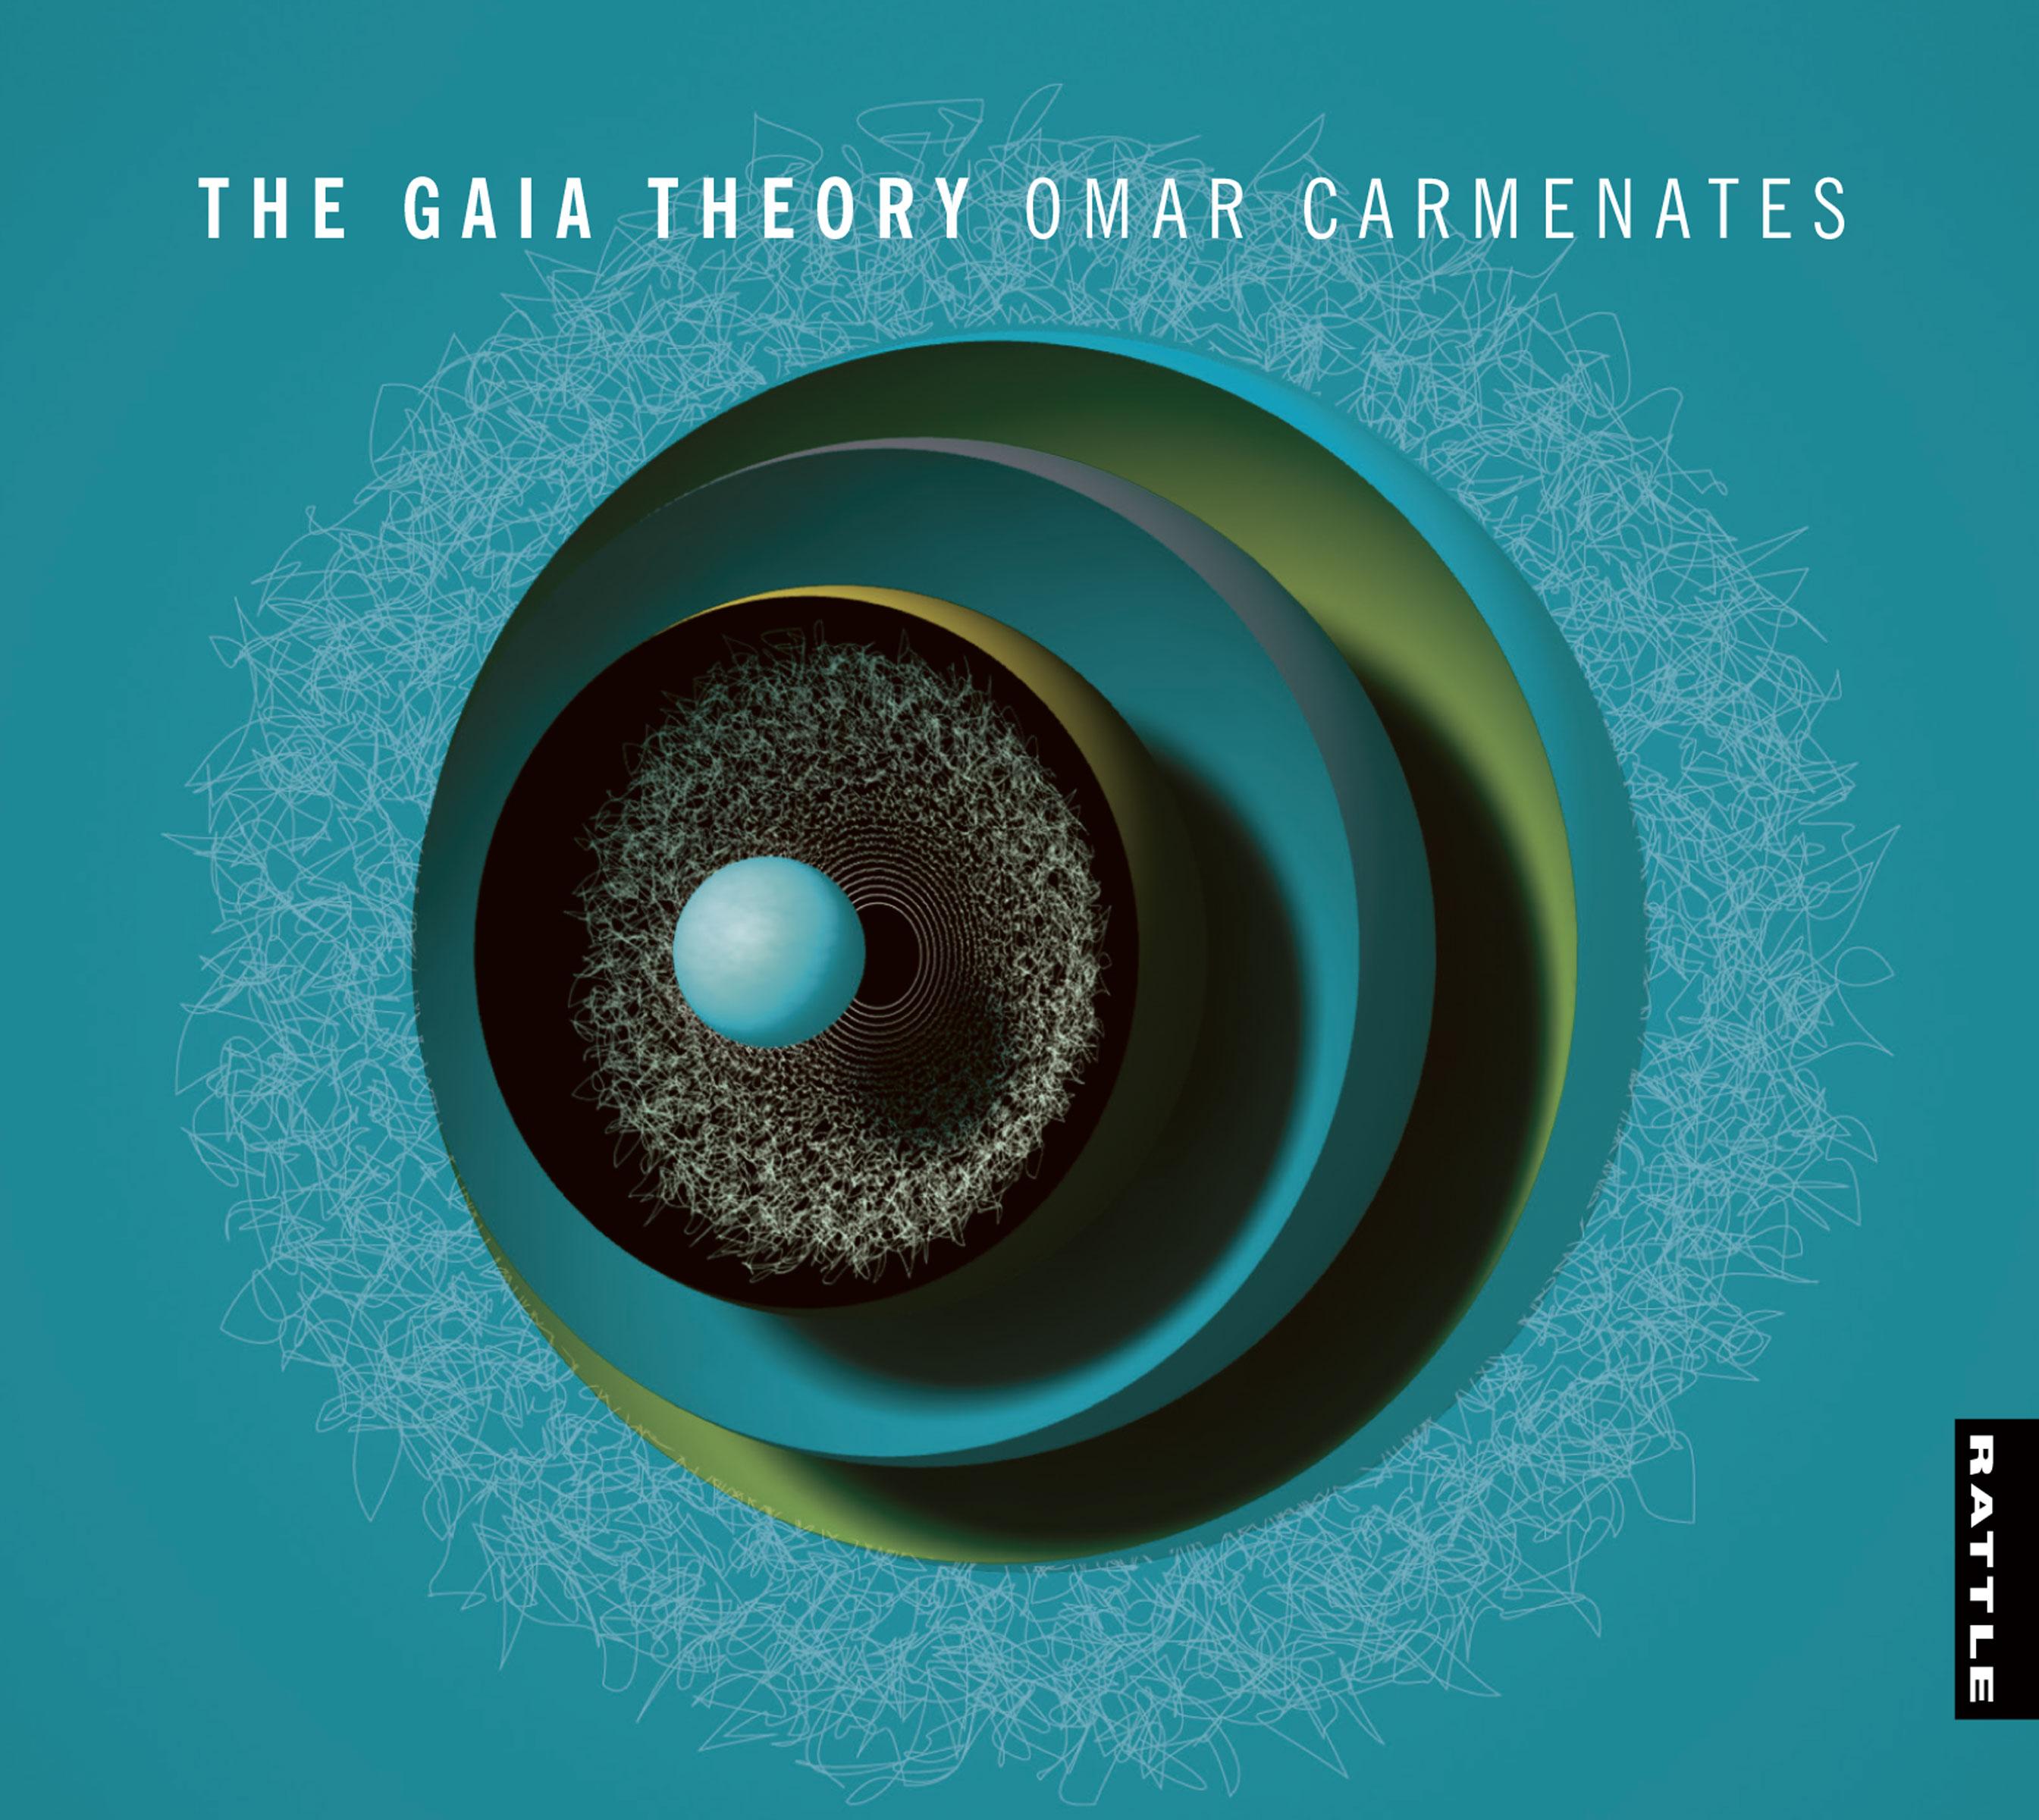 Omar Carmenates | The Gaia Theory - downloadable MP3 ALBUM